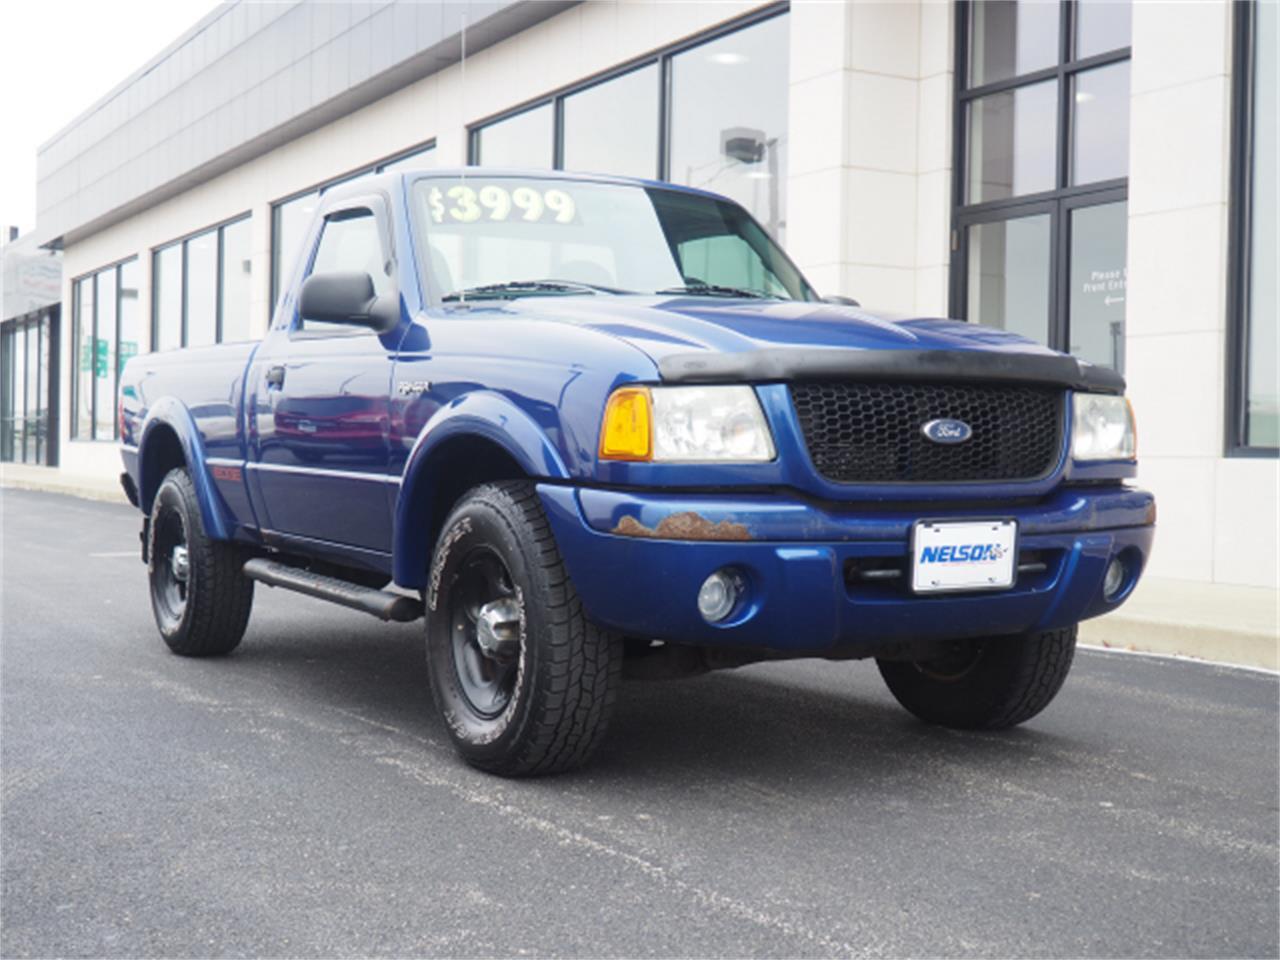 2003 Ford Ranger For Sale >> 2003 Ford Ranger For Sale Classiccars Com Cc 1179401